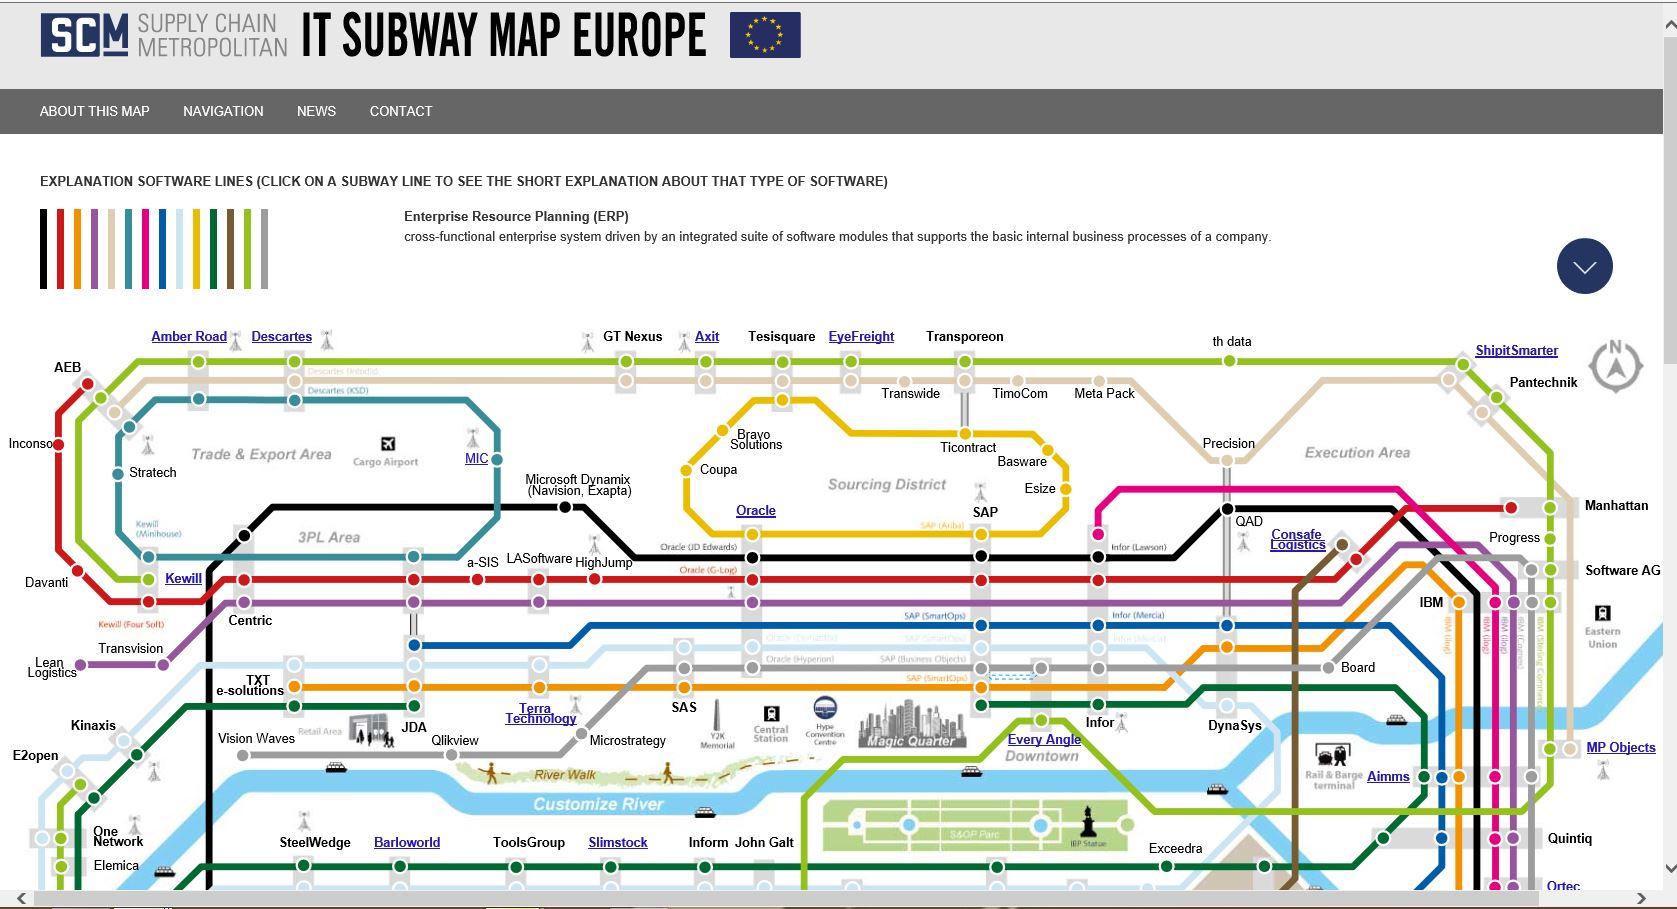 Subway Map 2016.Supply Chain Movement Starts Updating The It Subway Map 2016